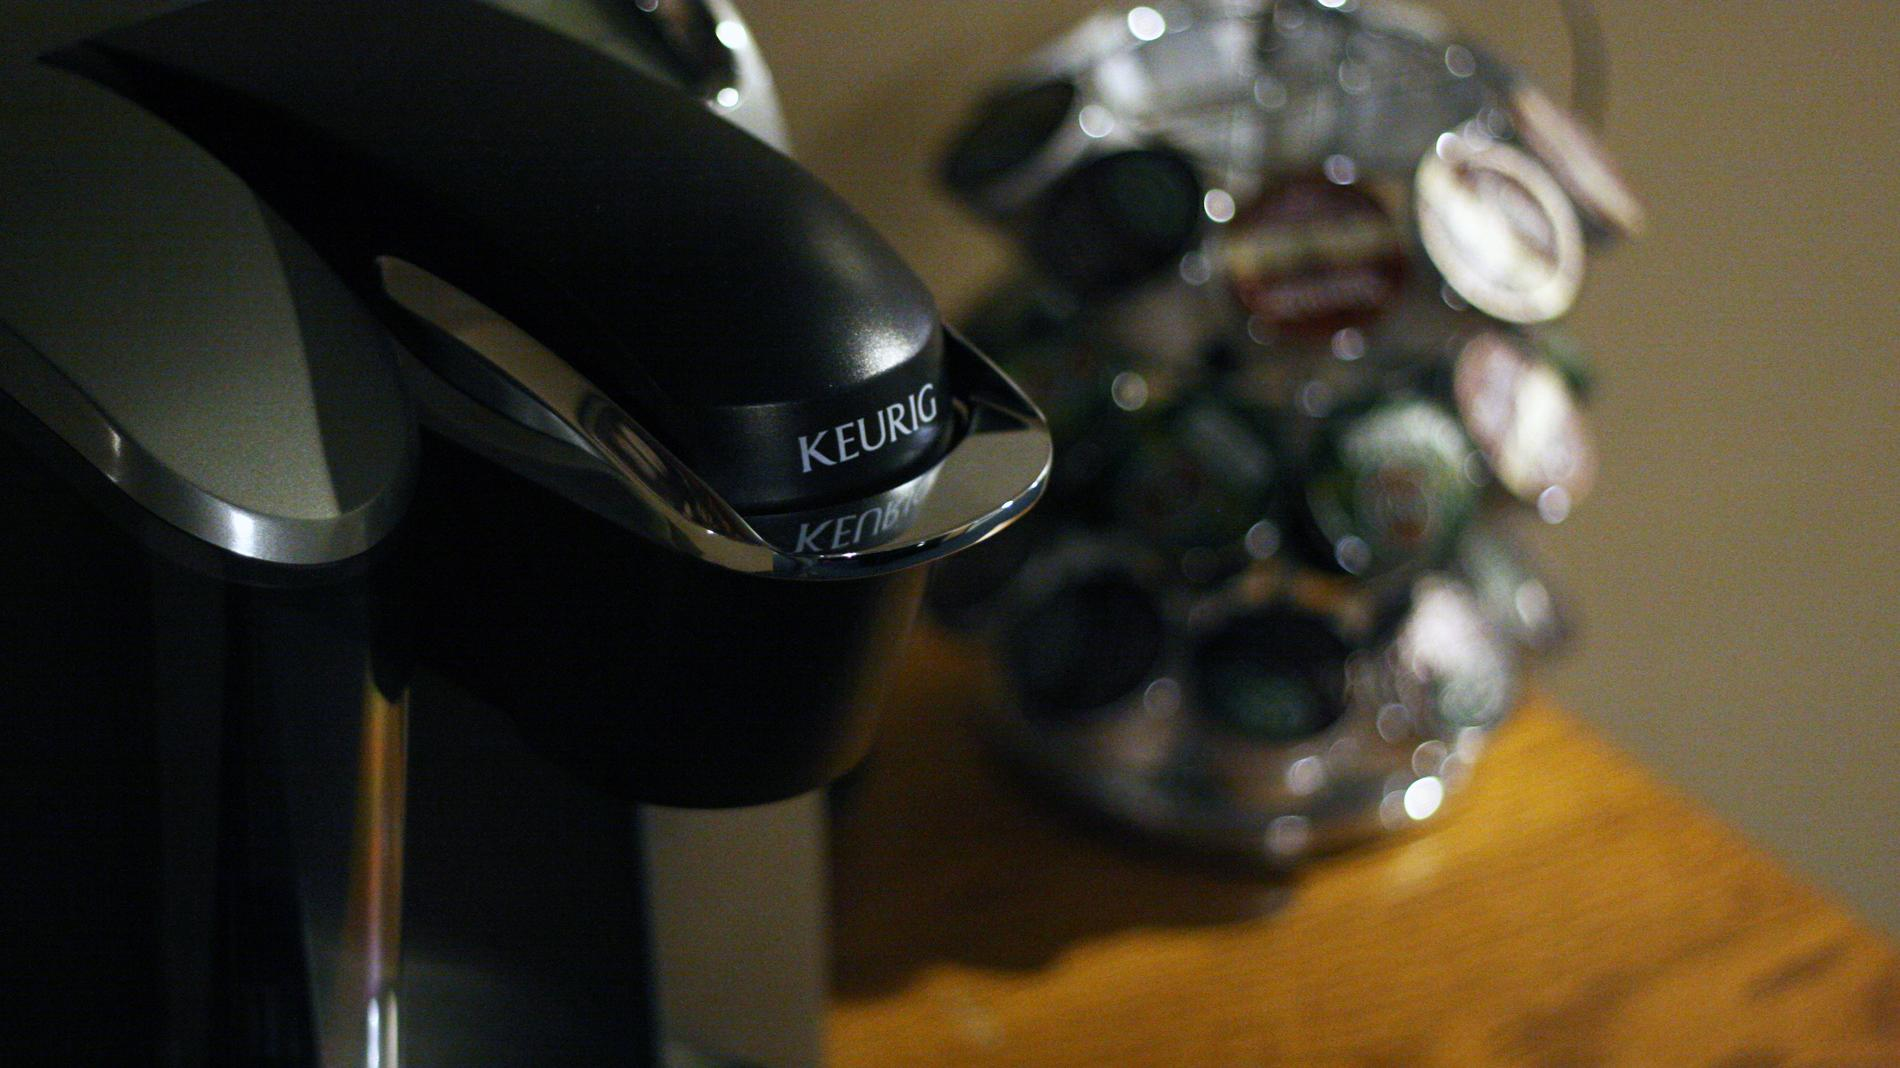 Keurig-booze-machine-.jpg